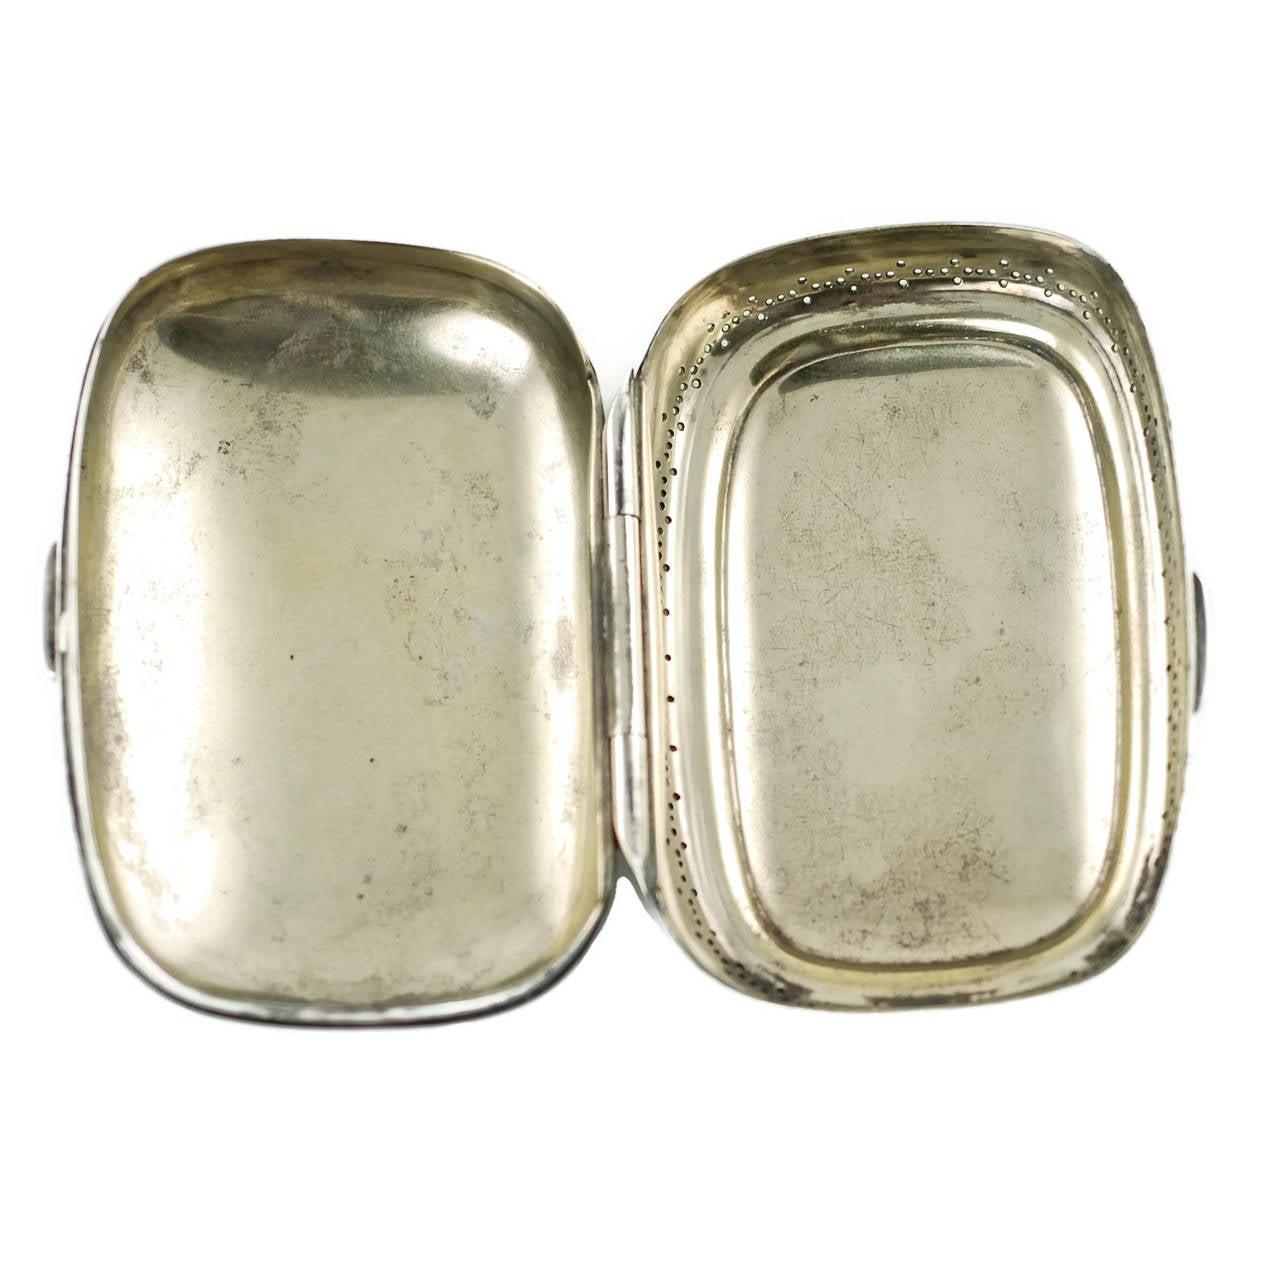 Edwardian Tiffany & Co. Sterling Silver 13-Piece Vanity Set For Sale 2